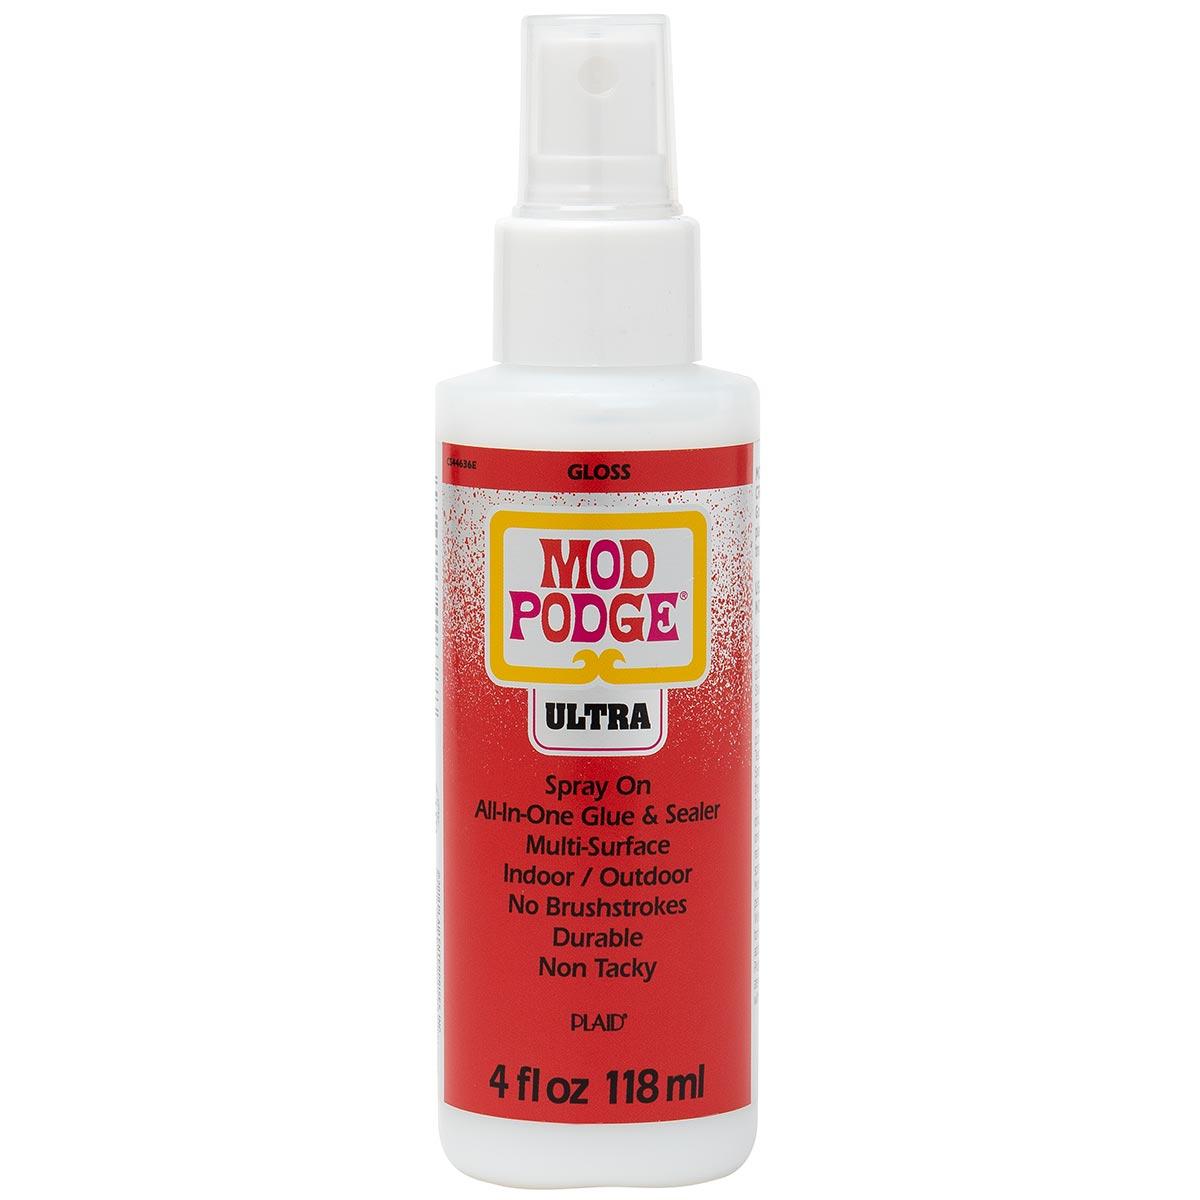 Mod Podge ® Ultra Gloss, 4 oz.